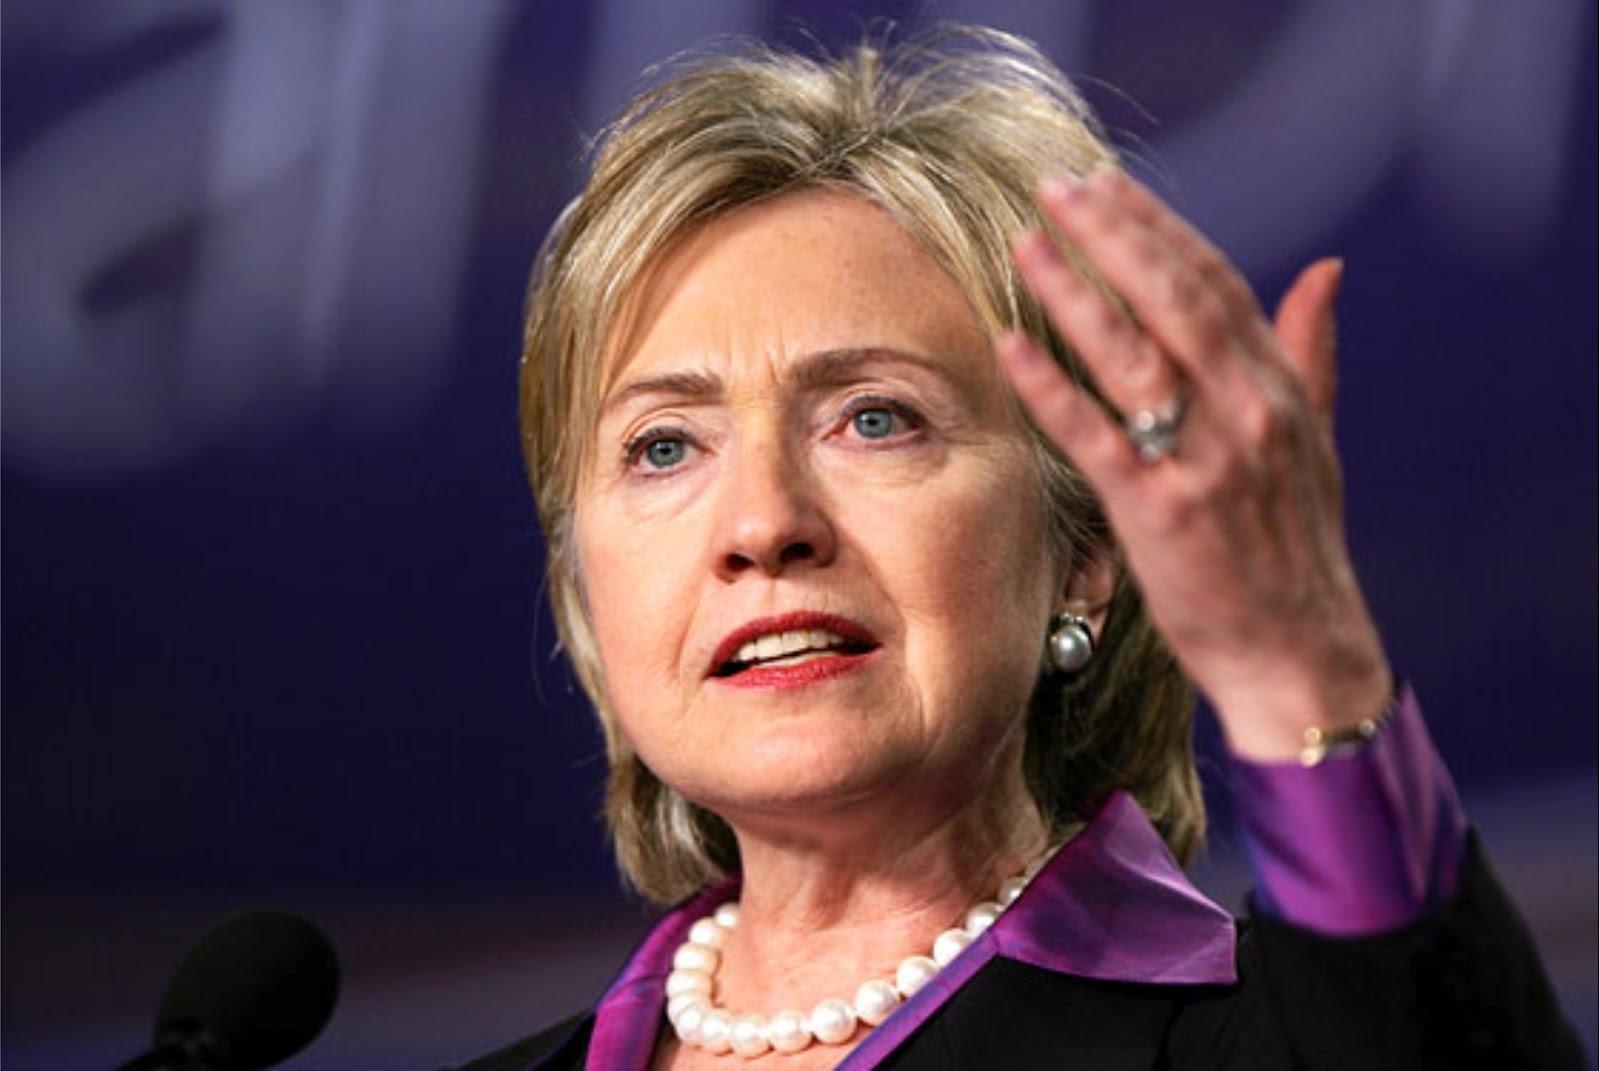 Хиллари Клинтон объявила В.Путина «угрозой американской демократии»